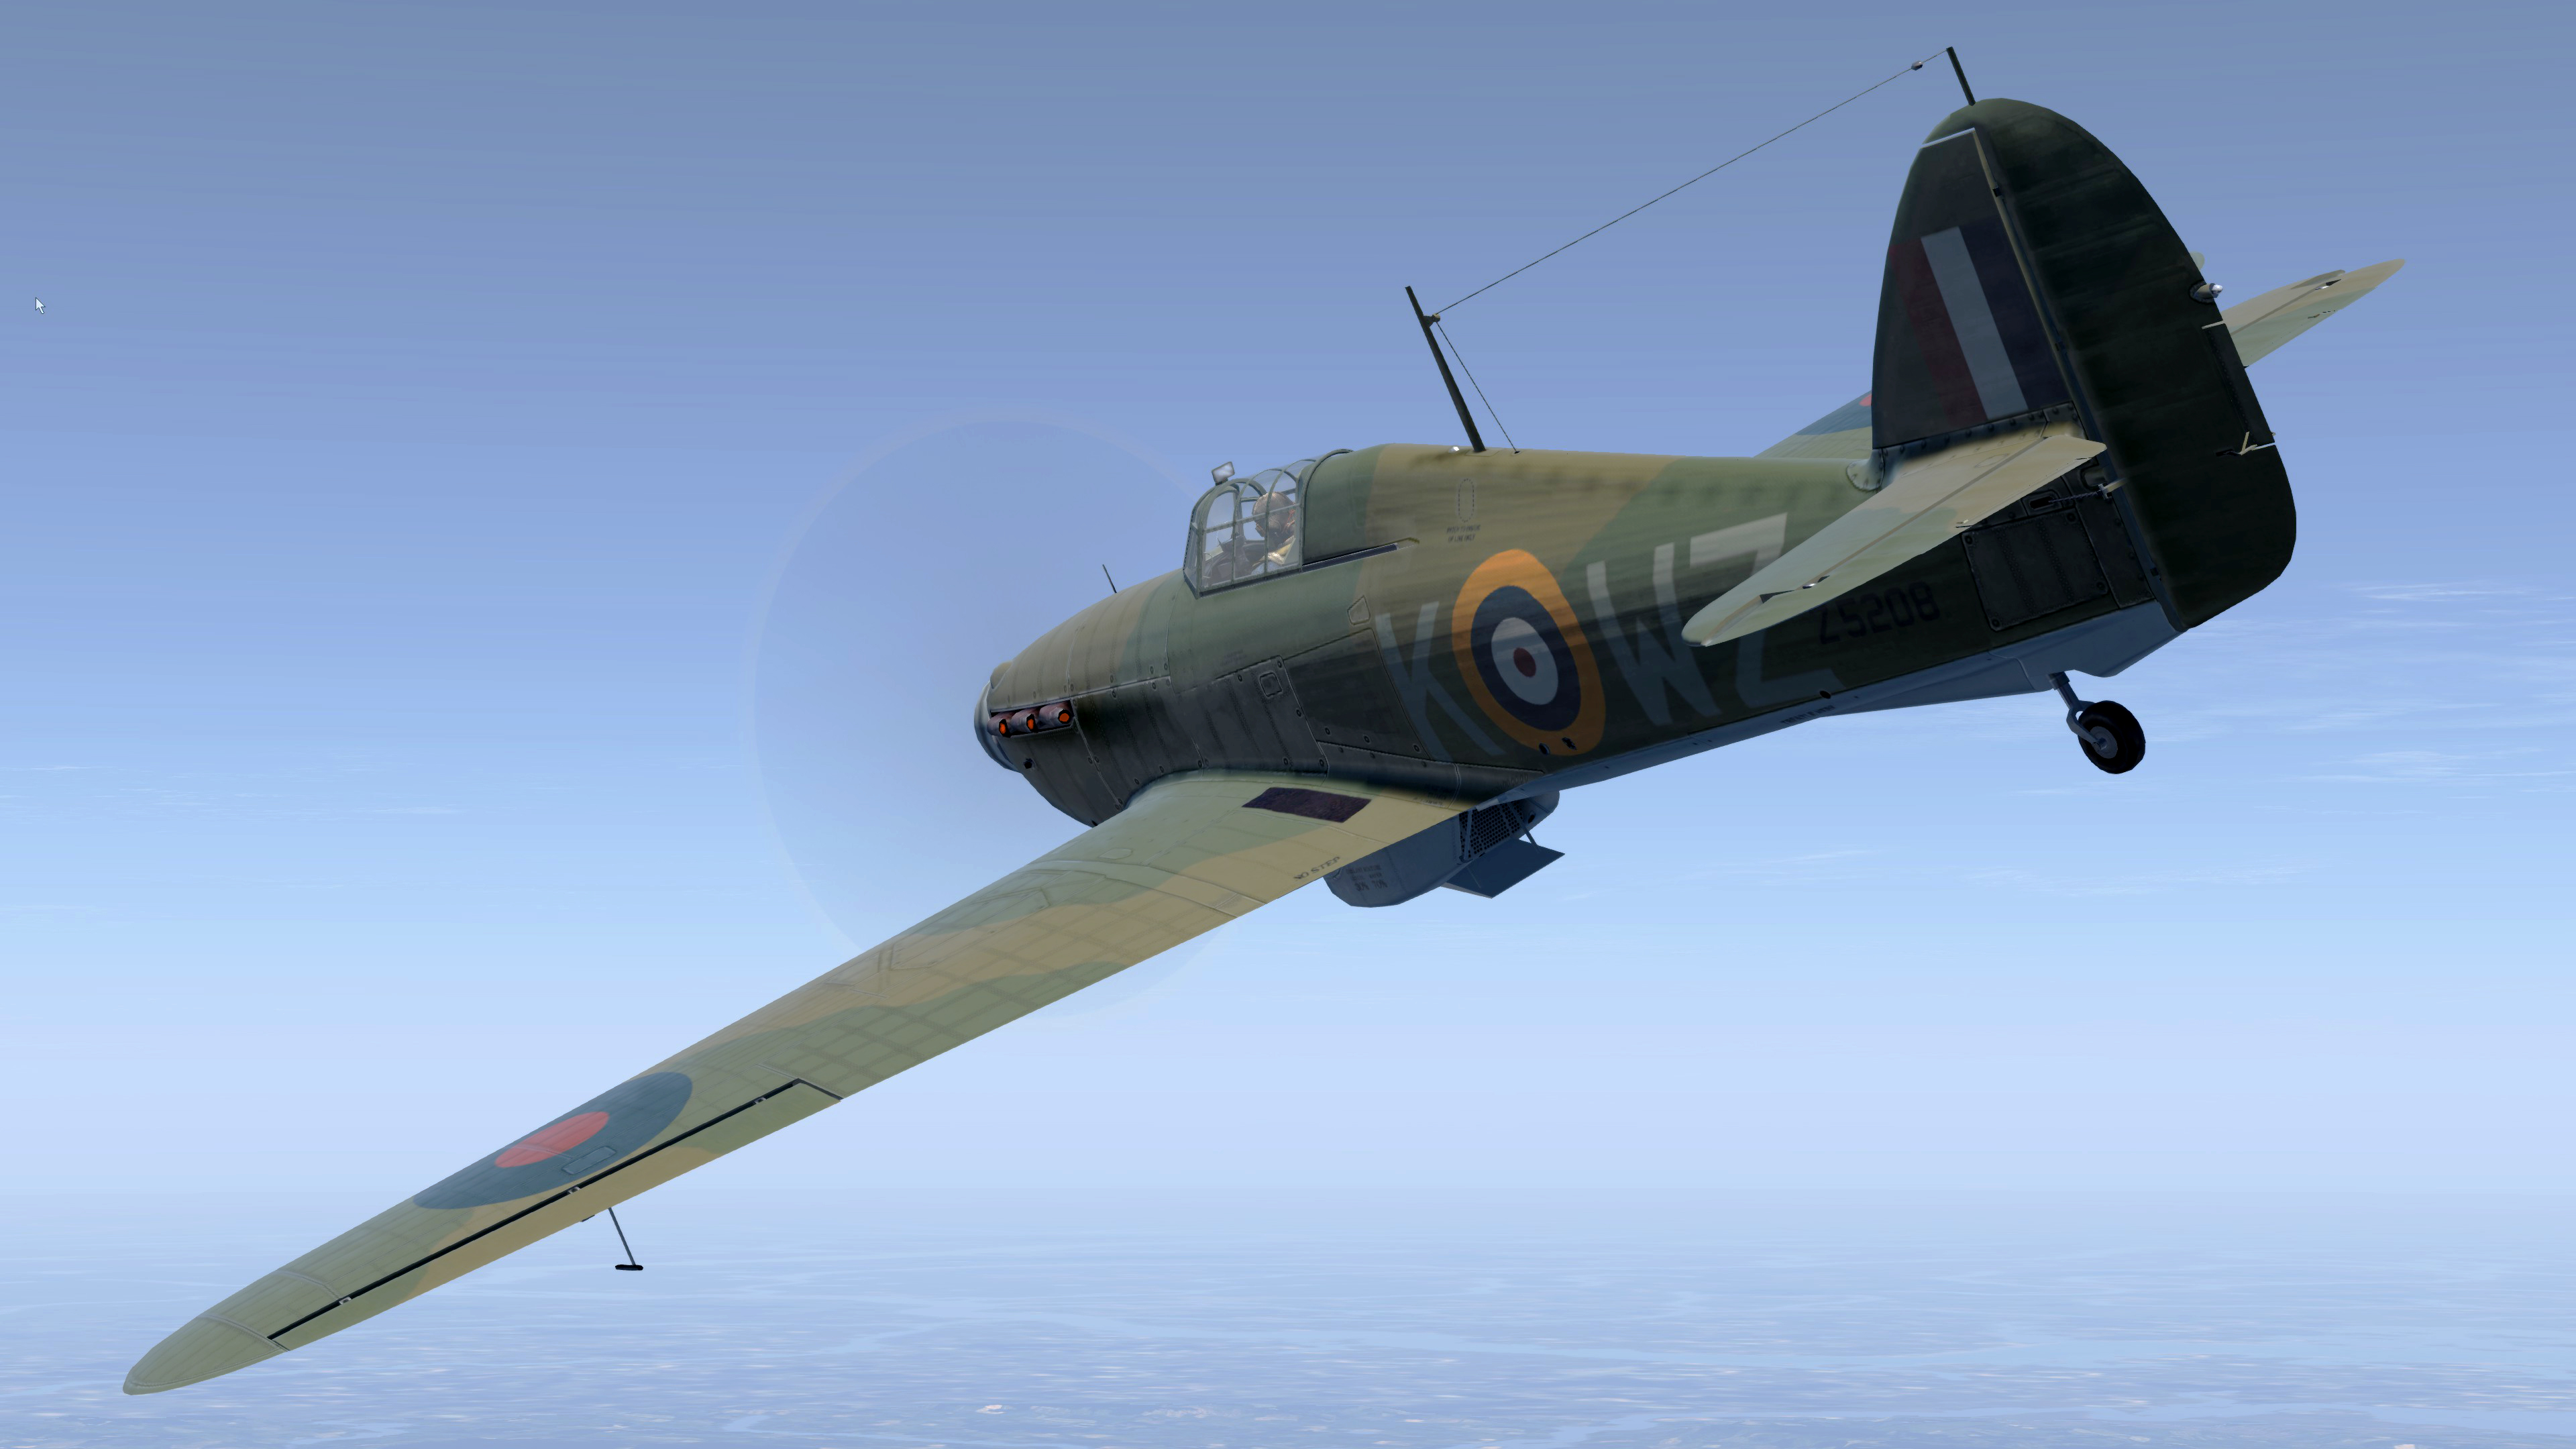 COD MS Hurricane II RAF 615Sqn Eric Carter Z5208 Northolt Oct 1940 V02